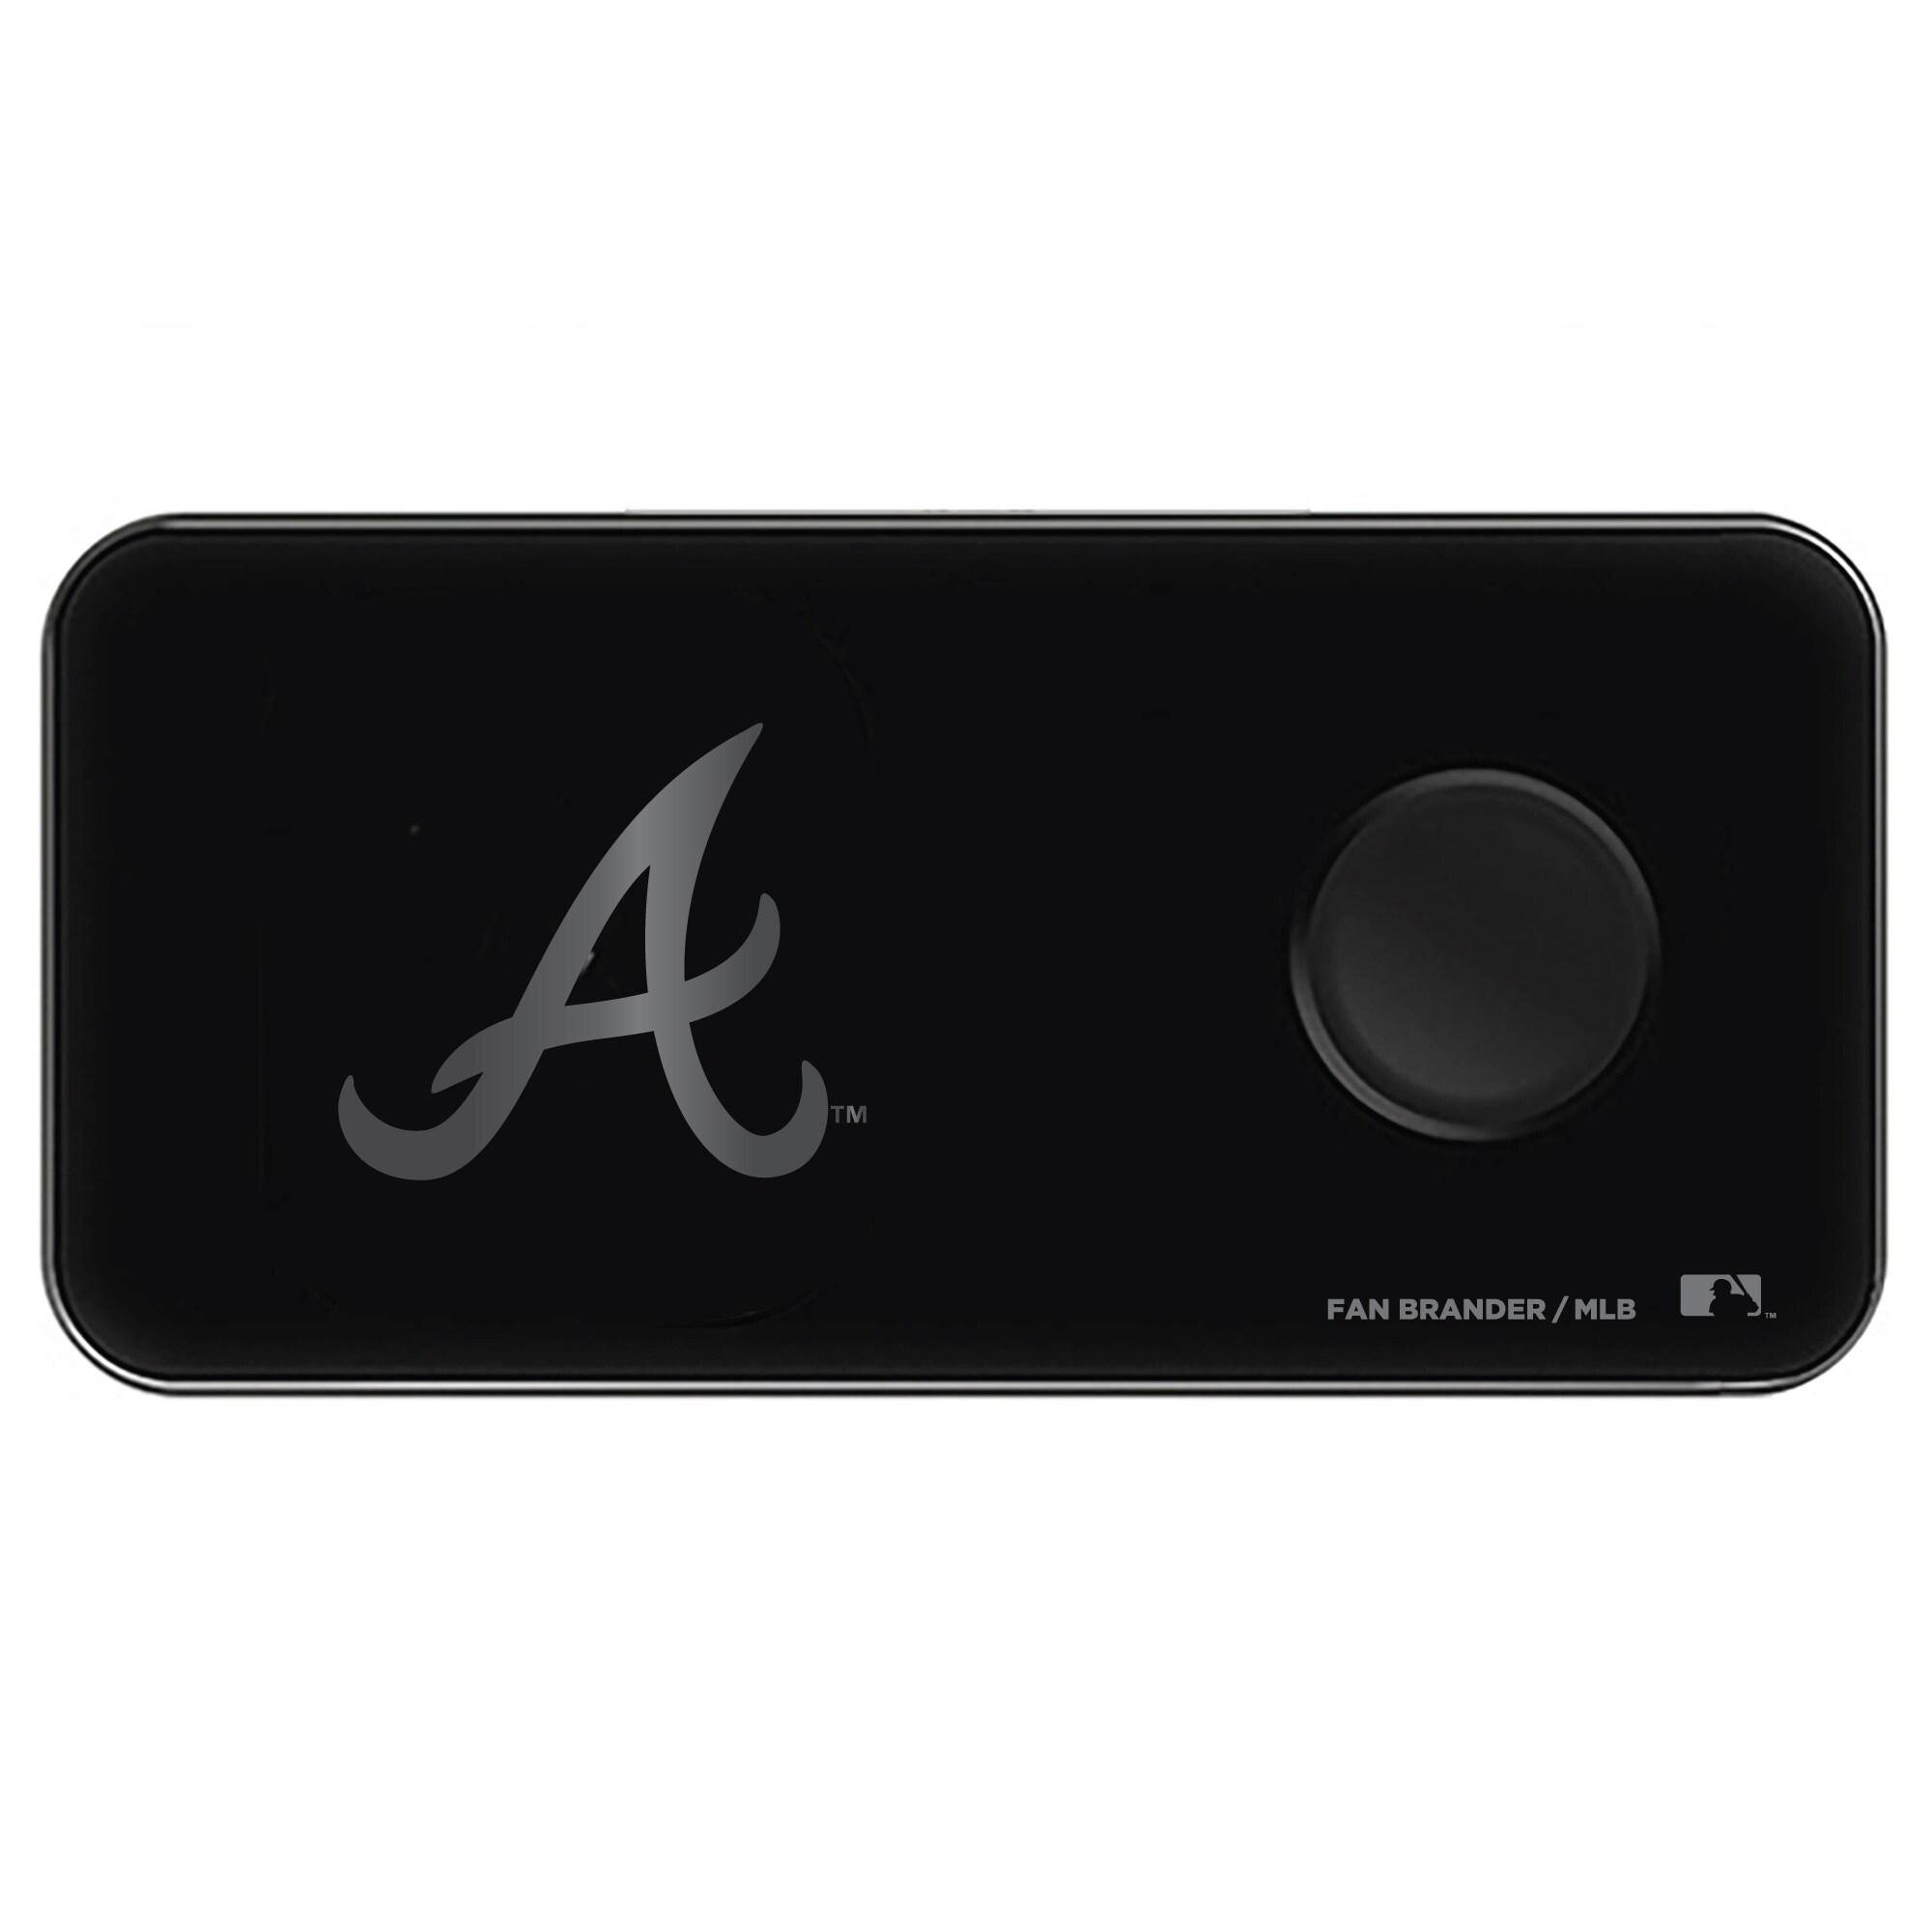 Atlanta Braves 3-in-1 Glass Wireless Charge Pad - Black